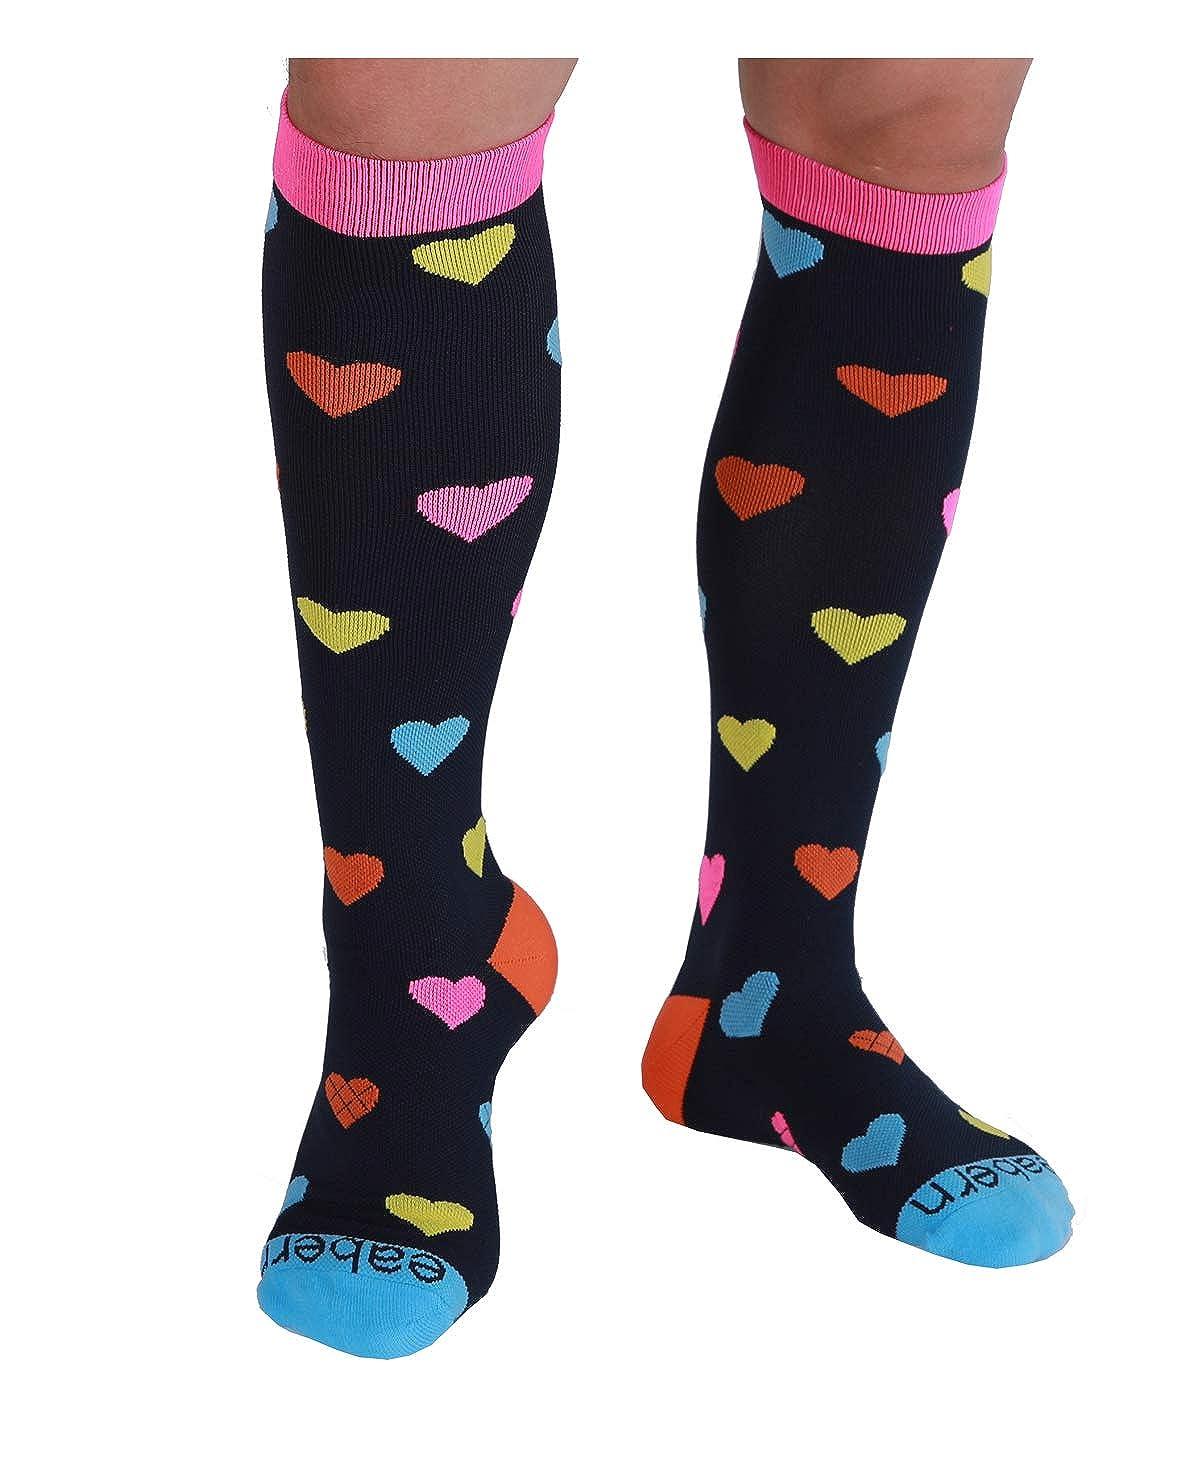 Eabern 20-30mmhg) SOCKSHOSIERY レディース B07FMNM5VR 633 Heart (2 shoe Pairs 20-30mmhg) size:8.5-11|633 M shoe size:8.5-11 M shoe size:8.5-11|633 Heart (2 Pairs 20-30mmhg), ブリヂストン快眠ショップ:0b6c7bf4 --- integralved.hu